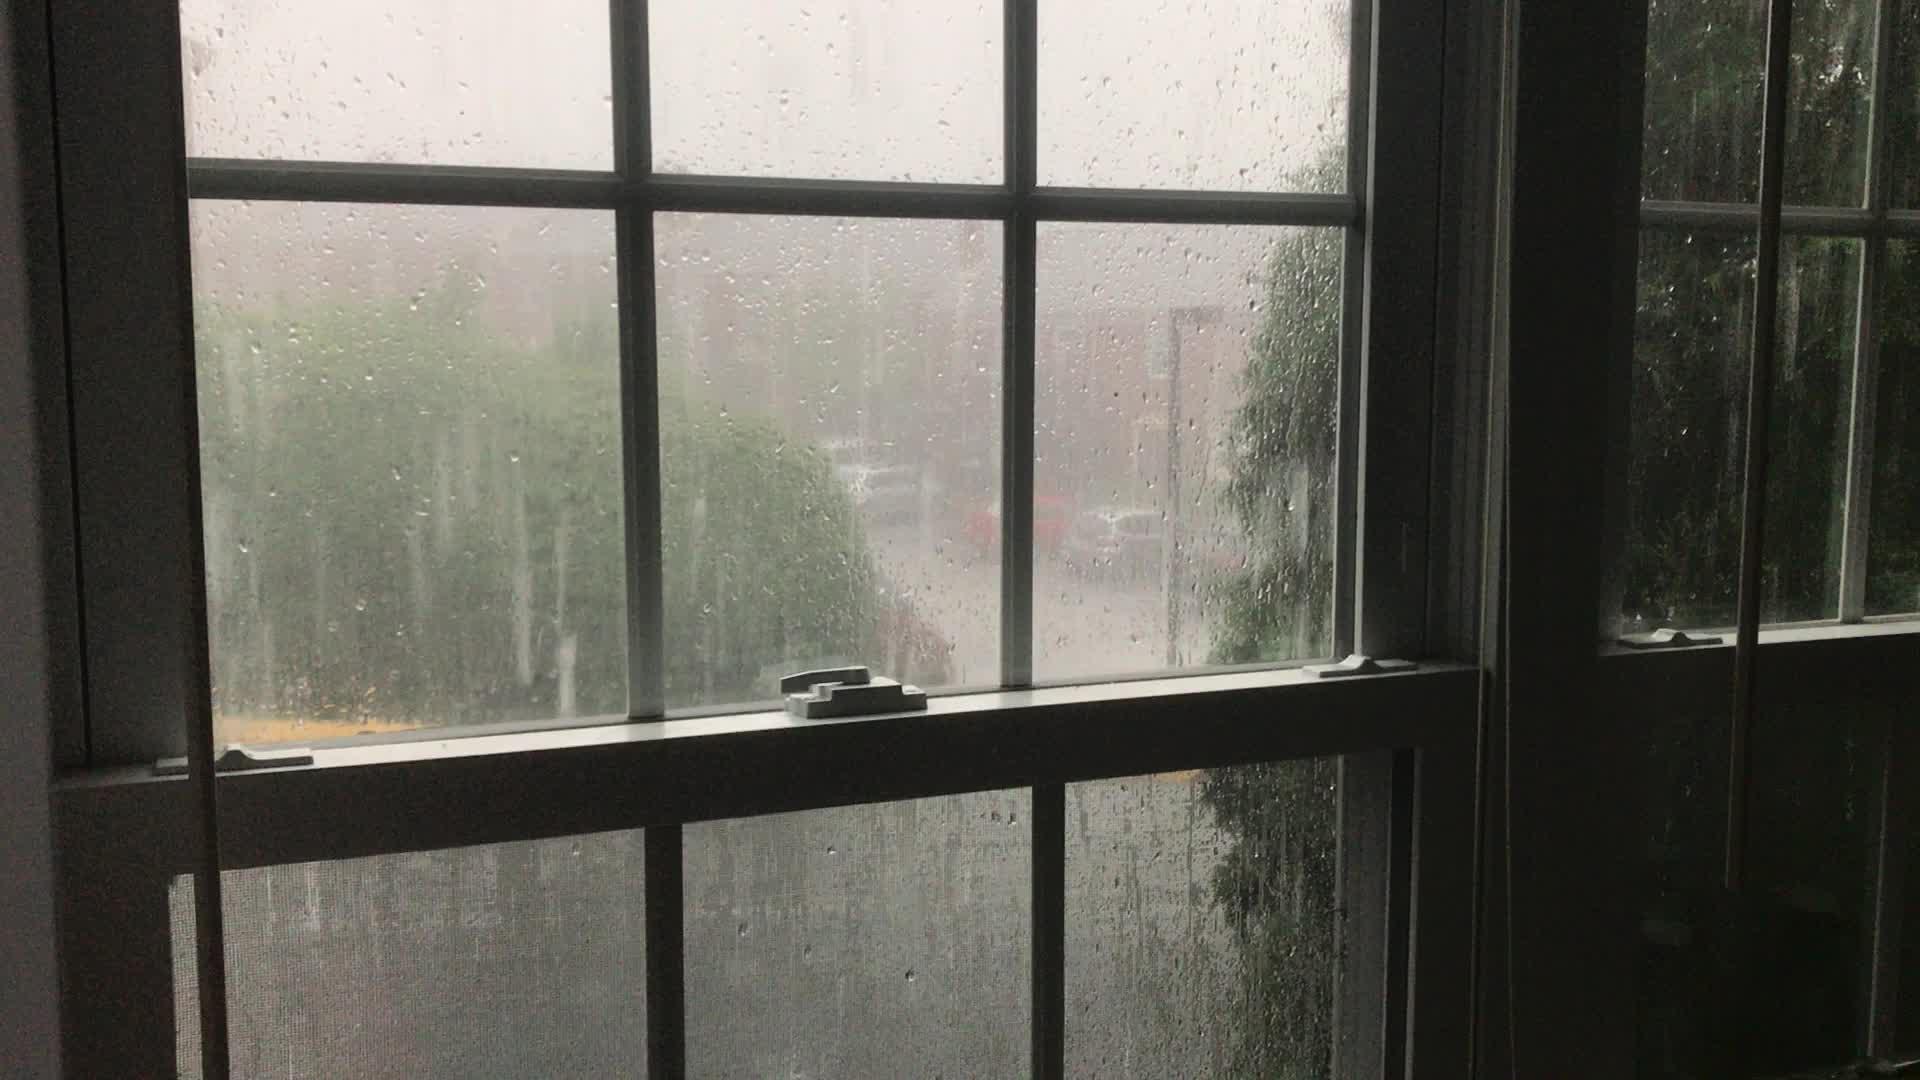 rain, raining, rainy, storm, wet, Rain rain go away GIFs